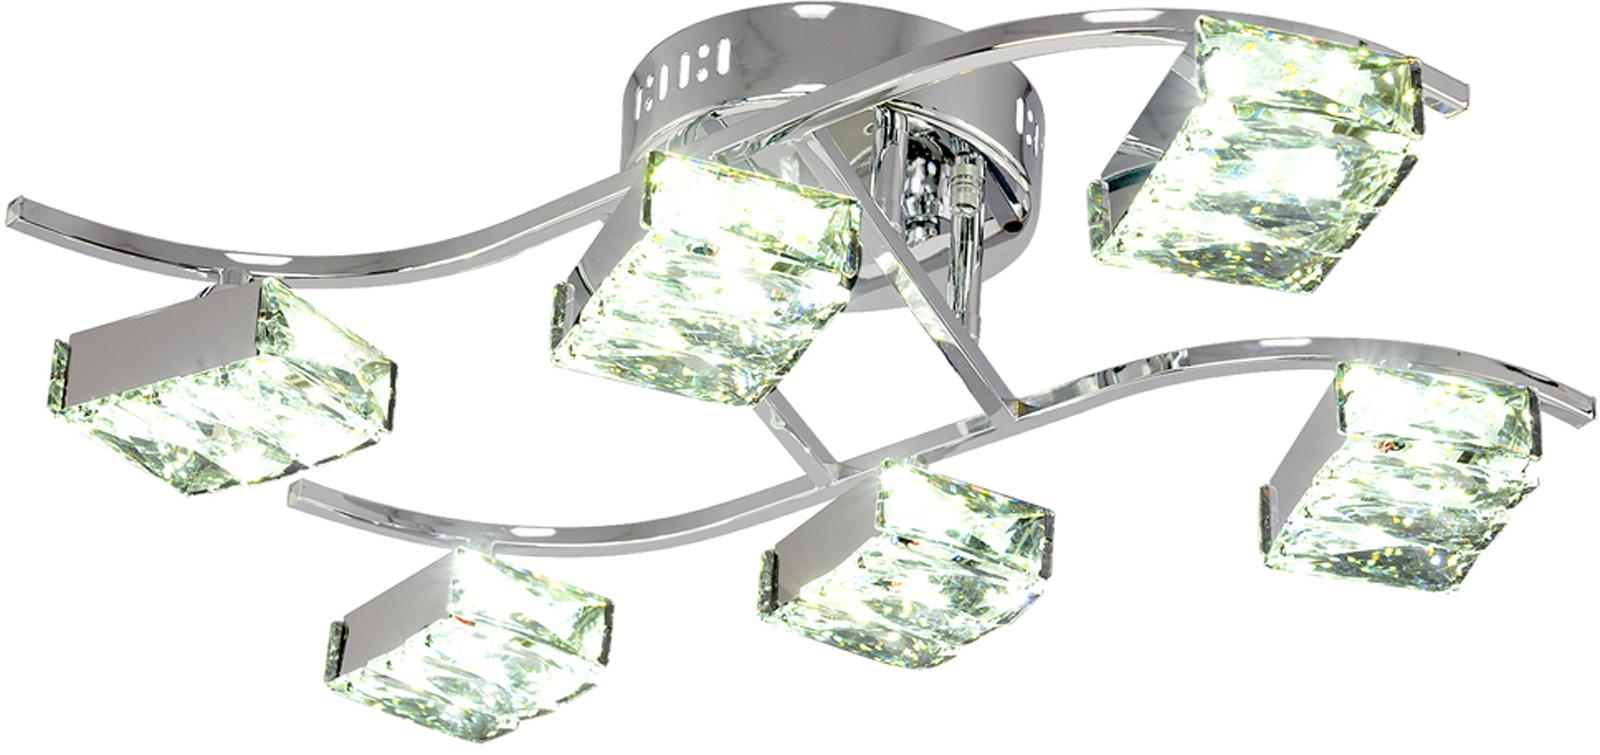 Потолочный светильник МАКСИСВЕТ 1663, 1-1663-6-CR Y LED, 570х350х160, 1-1663-6-CR Y LED, серебристый максисвет потолочная люстра максисвет design геометрия 1 1696 4 cr y led